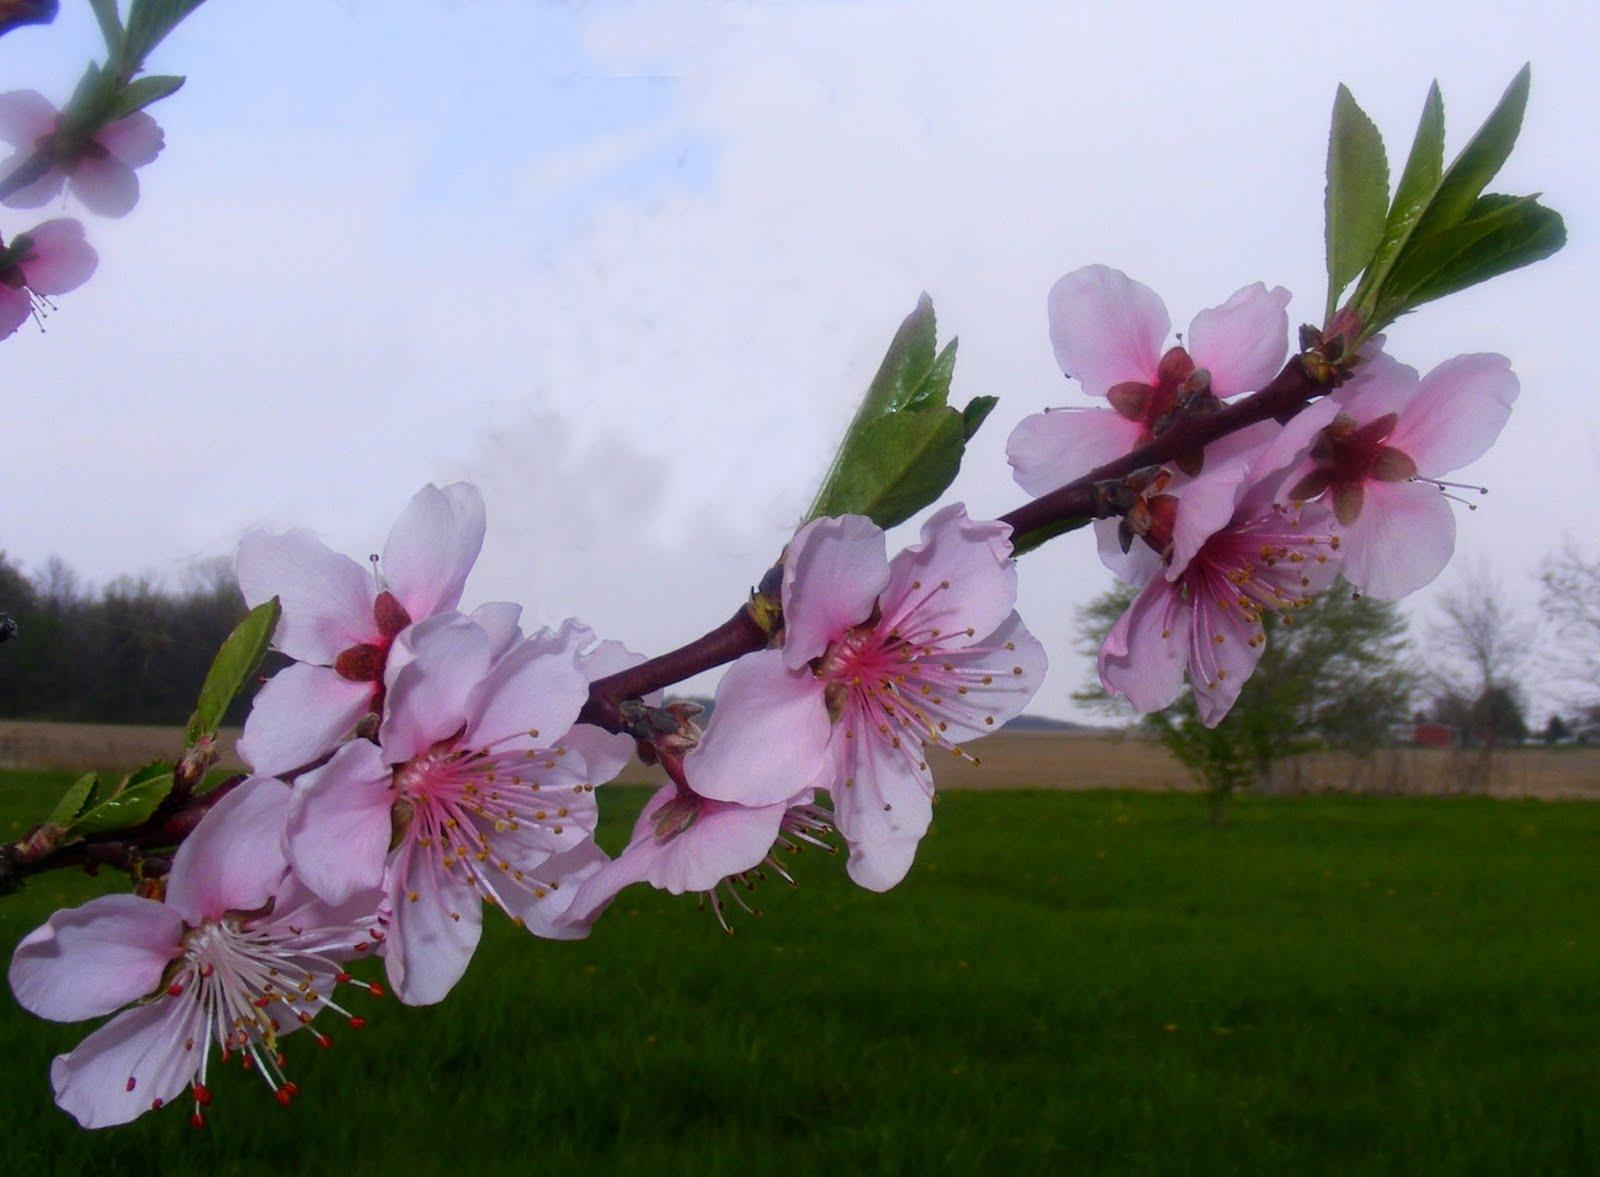 cherry blossom branch - photo #26